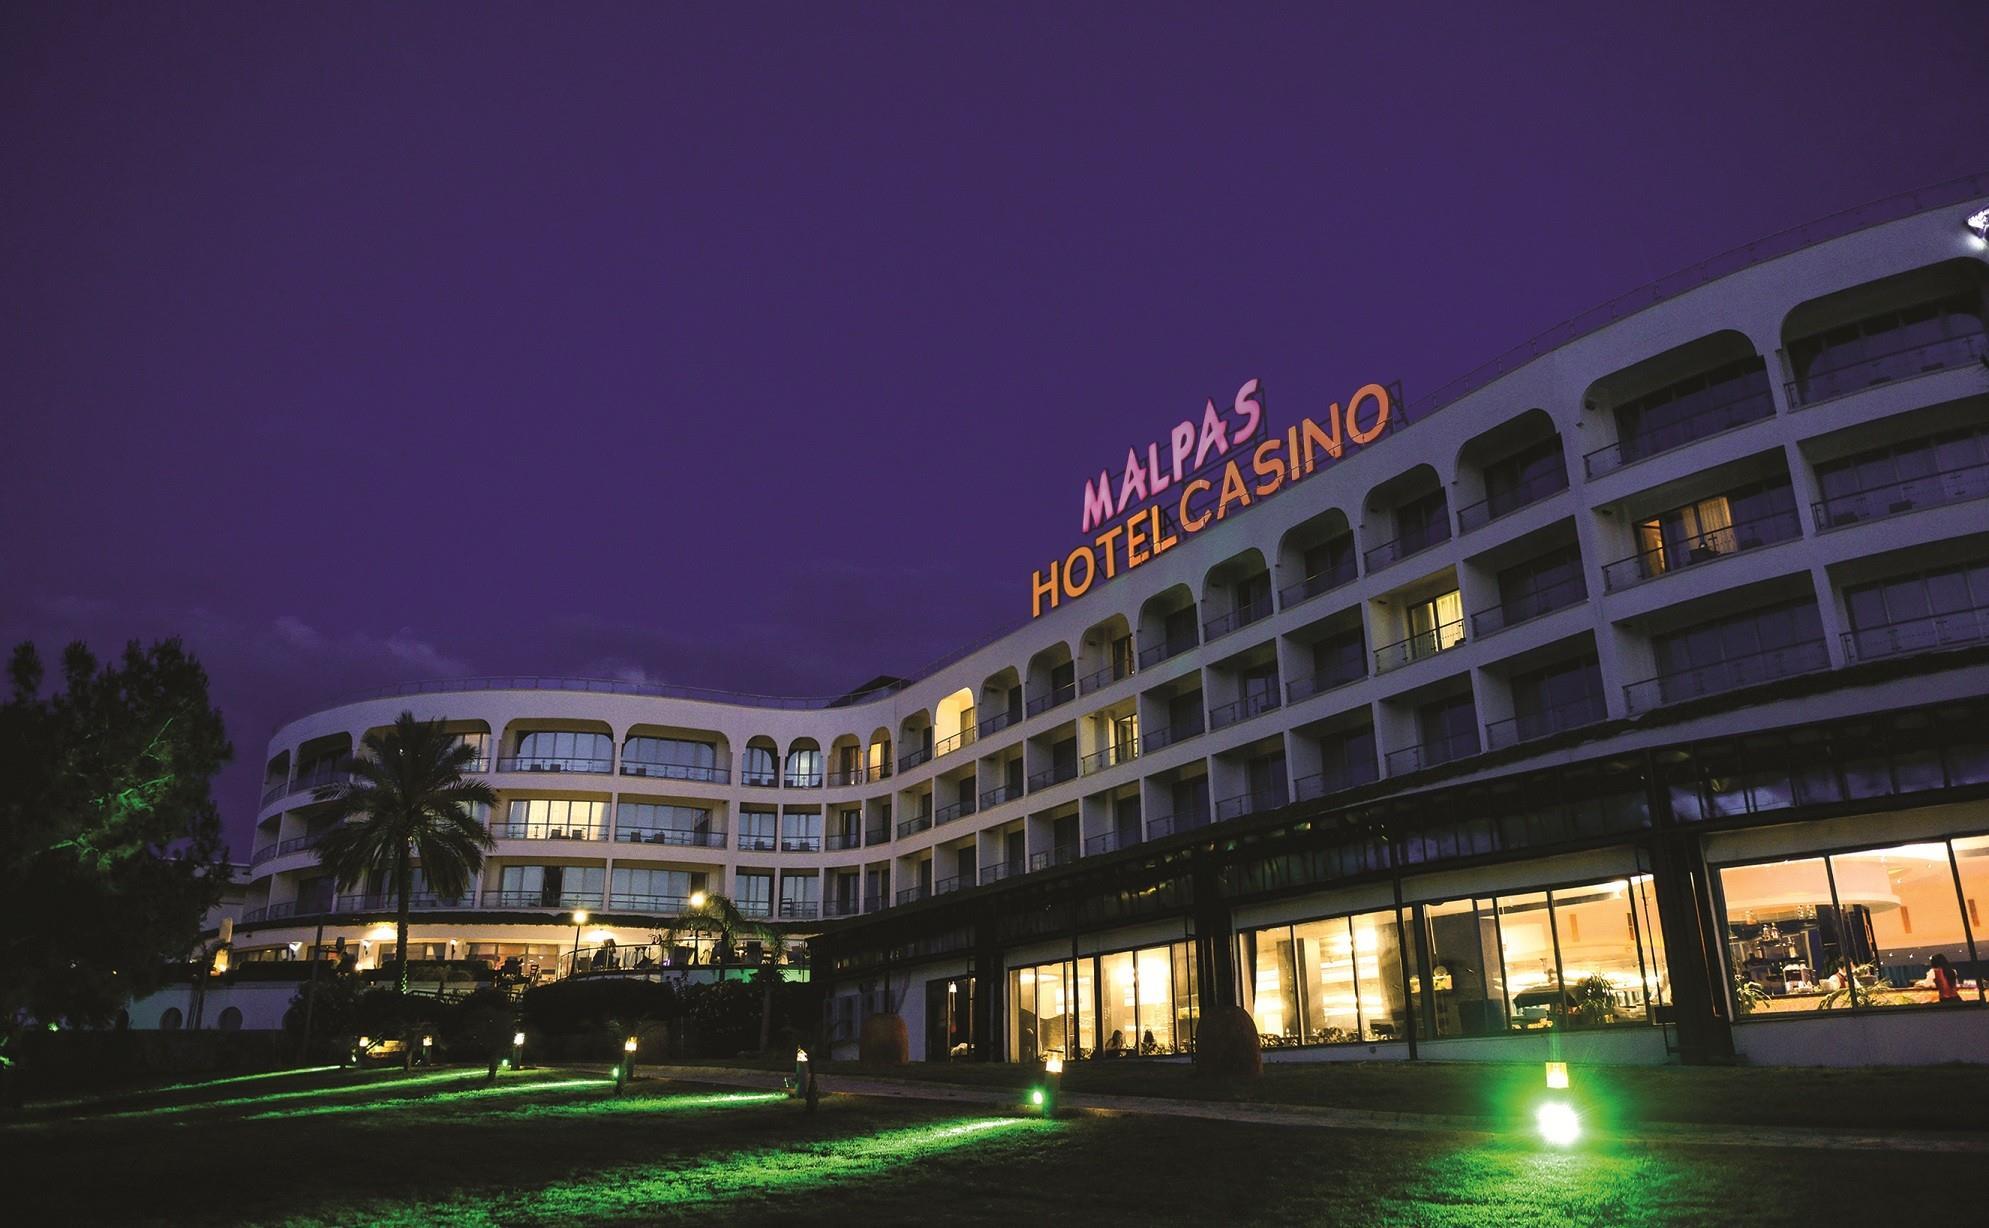 Malpas Hotel205312